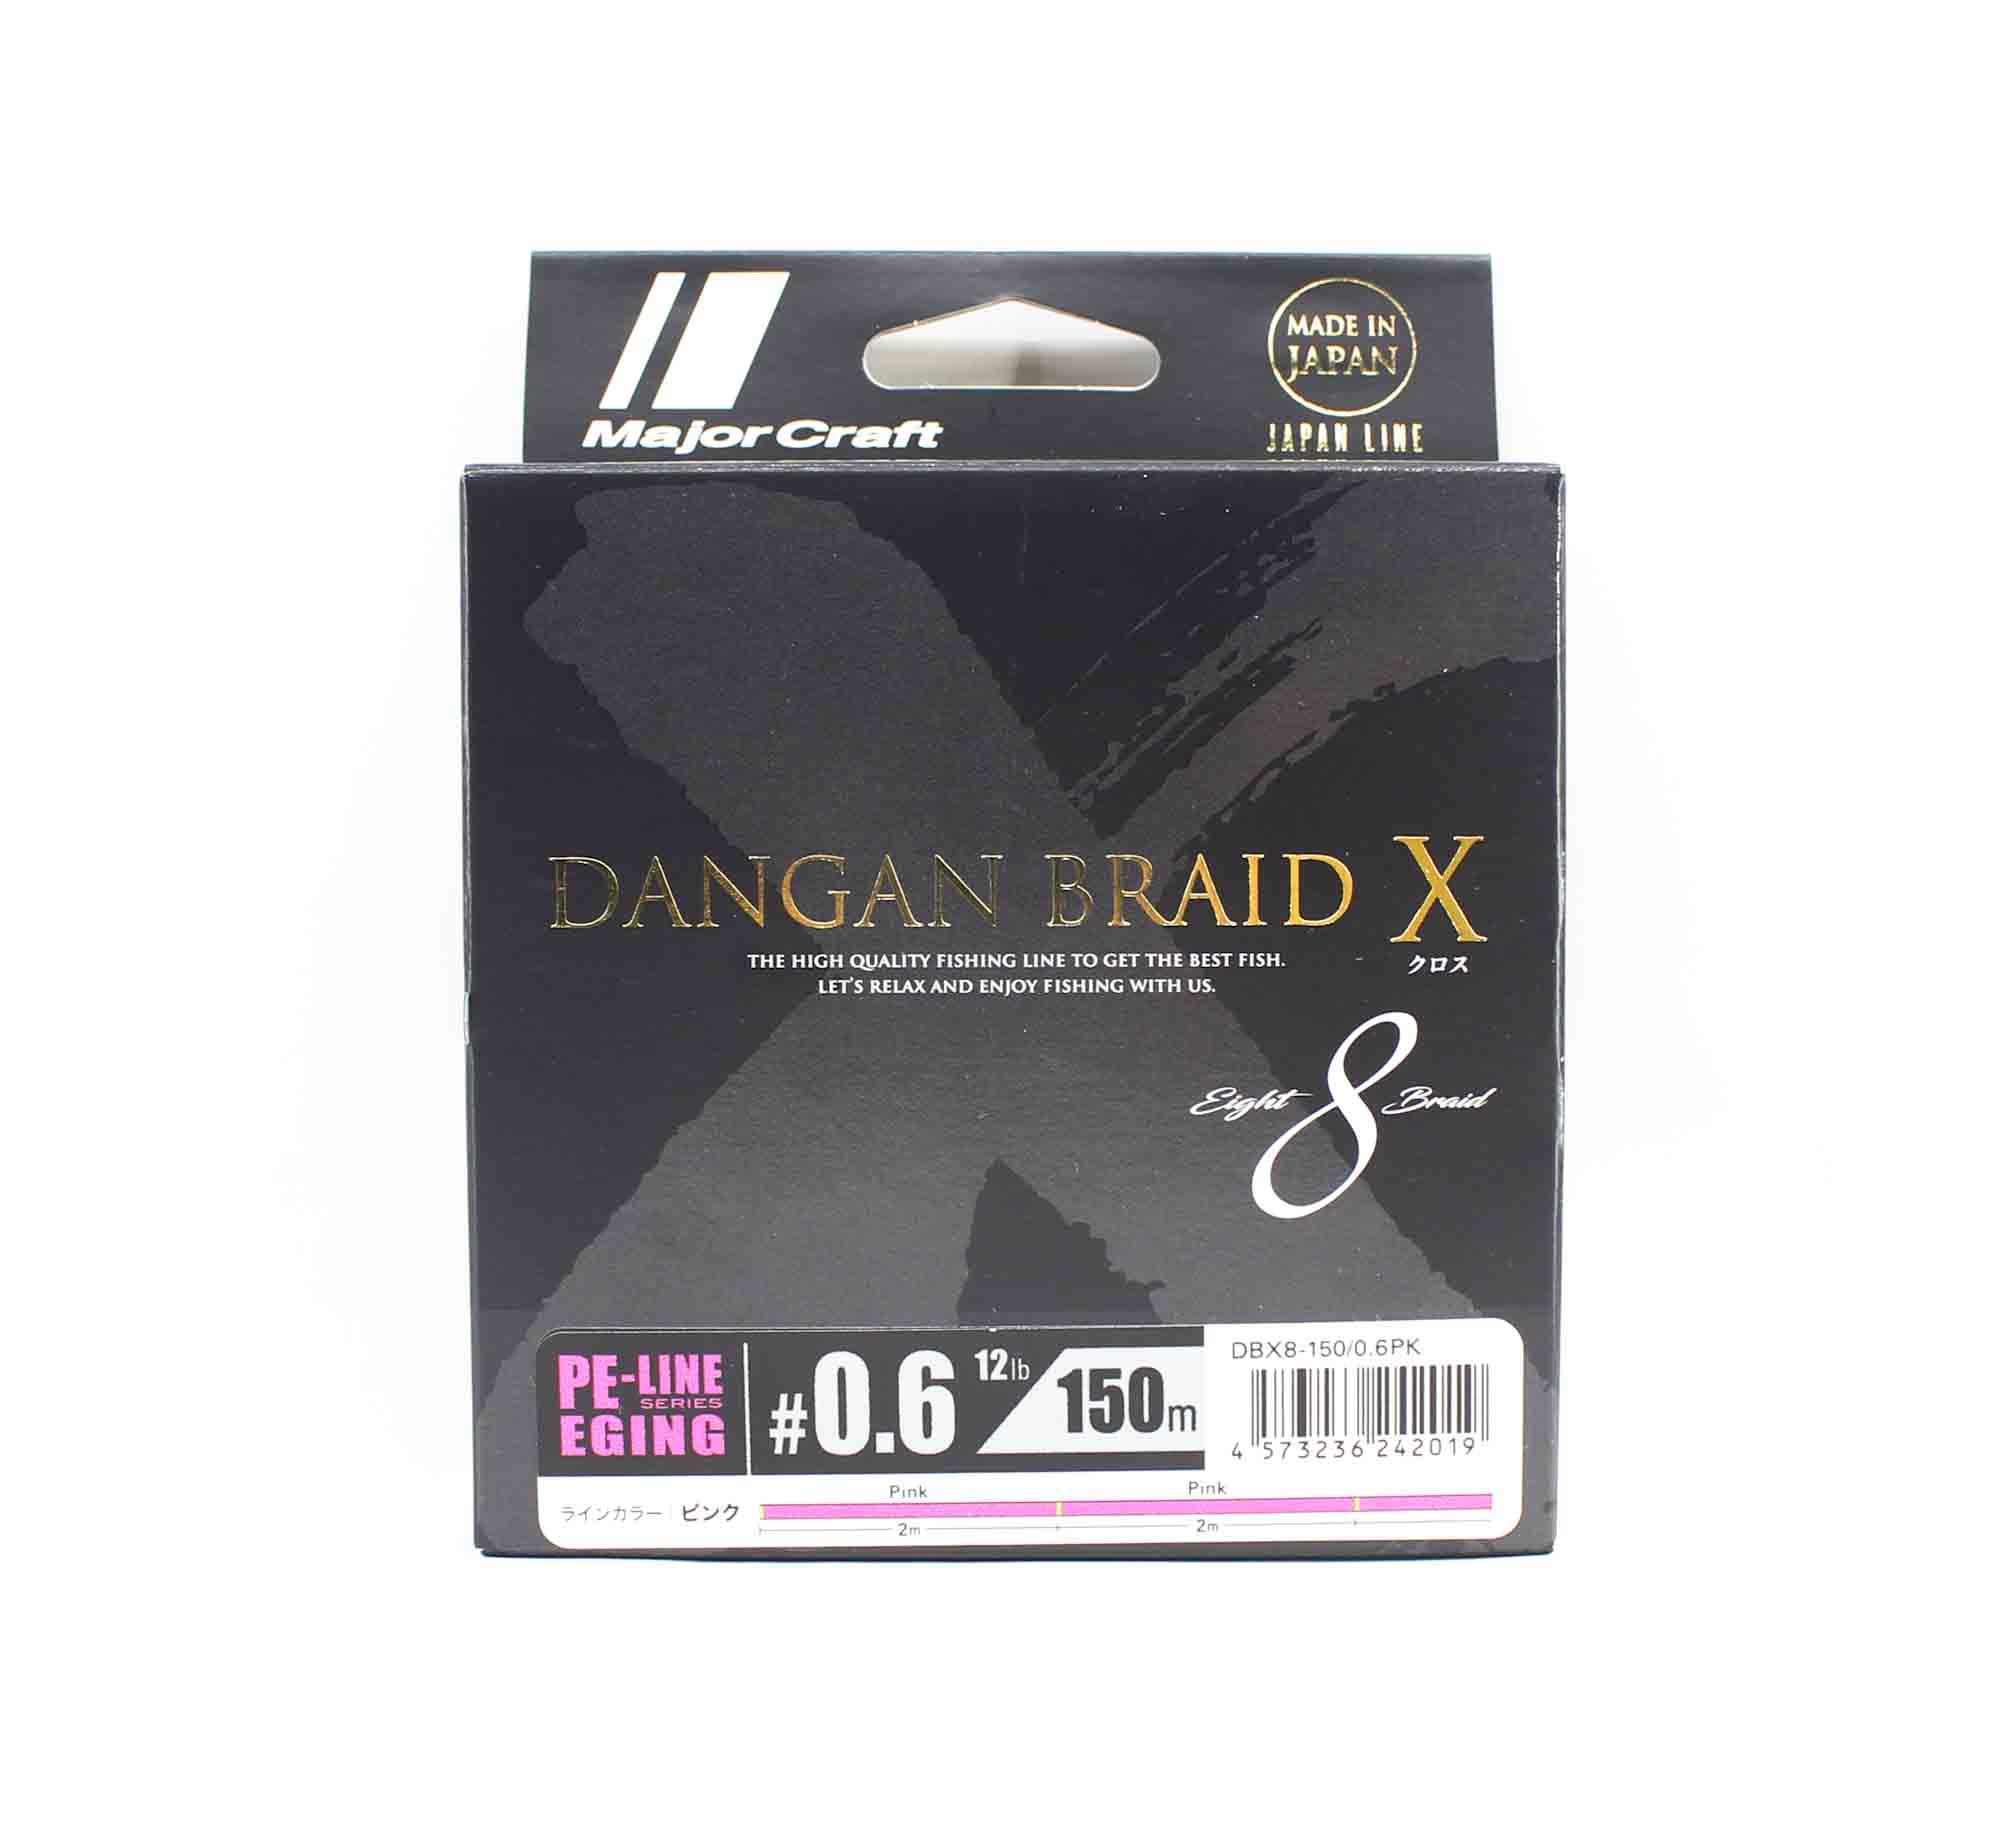 Major Craft Dangan Braid X Line X8 150m P.E 0.6 Pink DBXE8-150/0.6PK (2019)